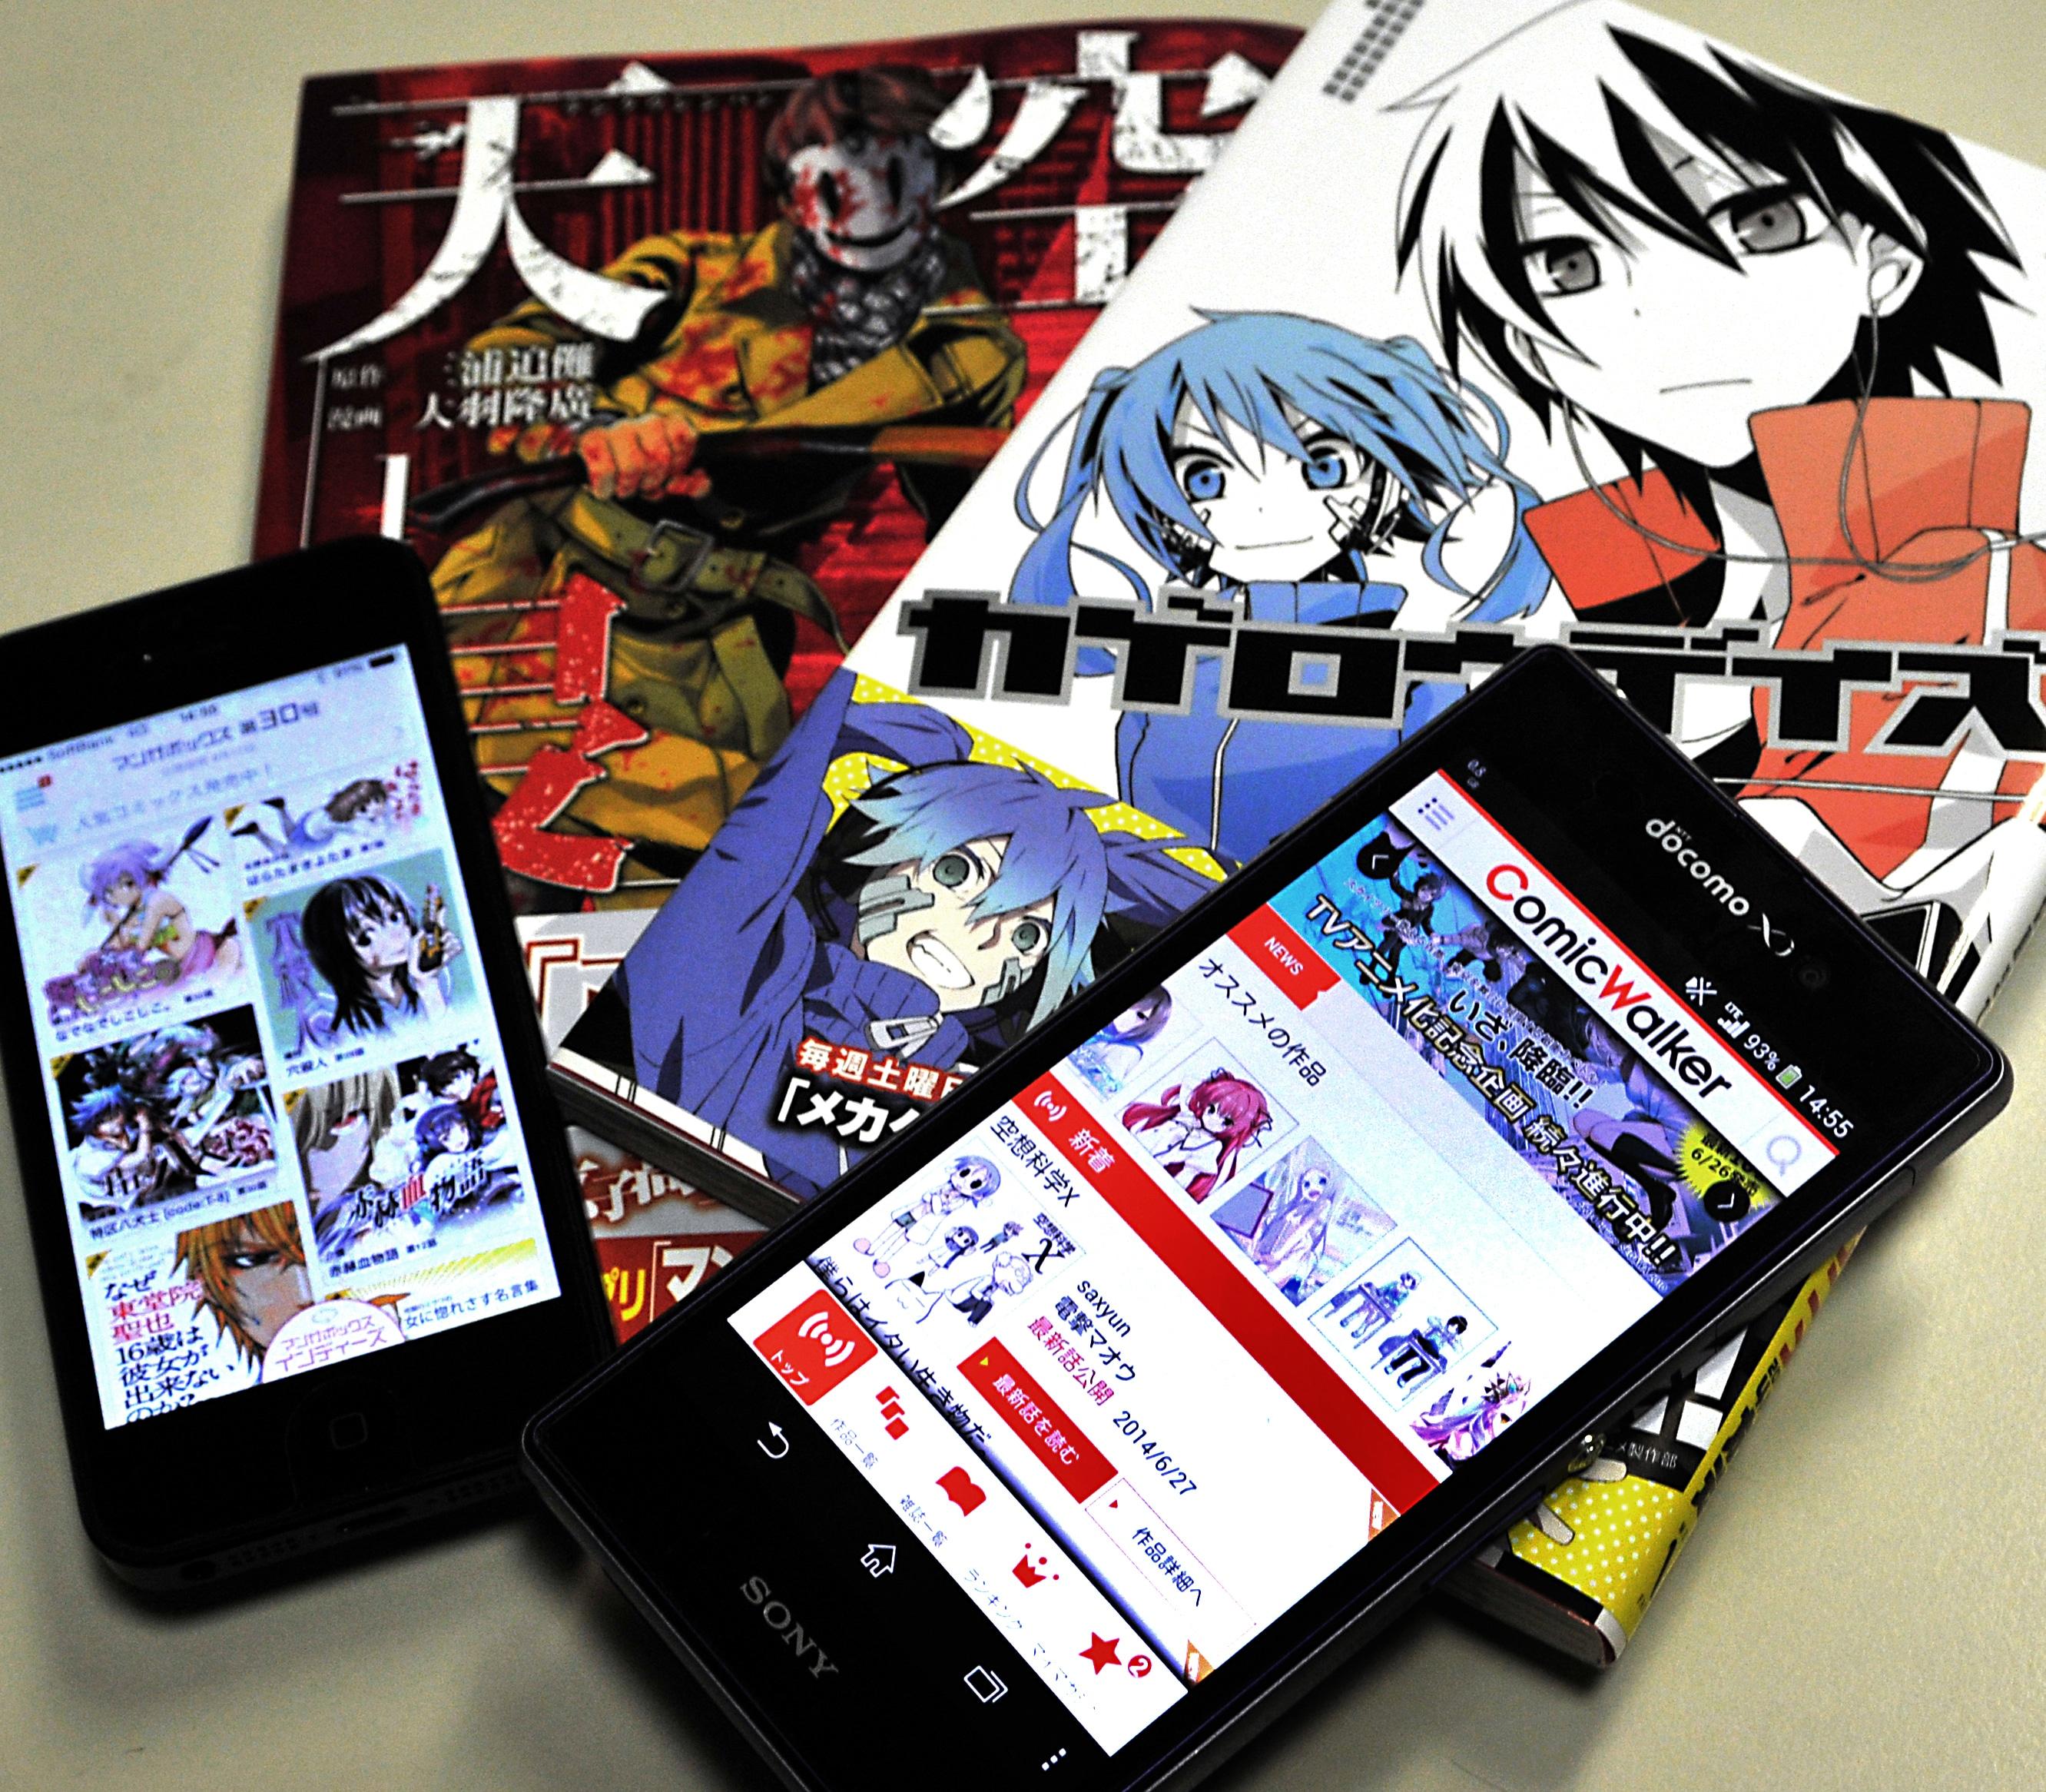 Anime Apri , image photo, Hodo-bu Nagata reports, on June 27, 2014. YOSHIAKI MIURA PHOTO